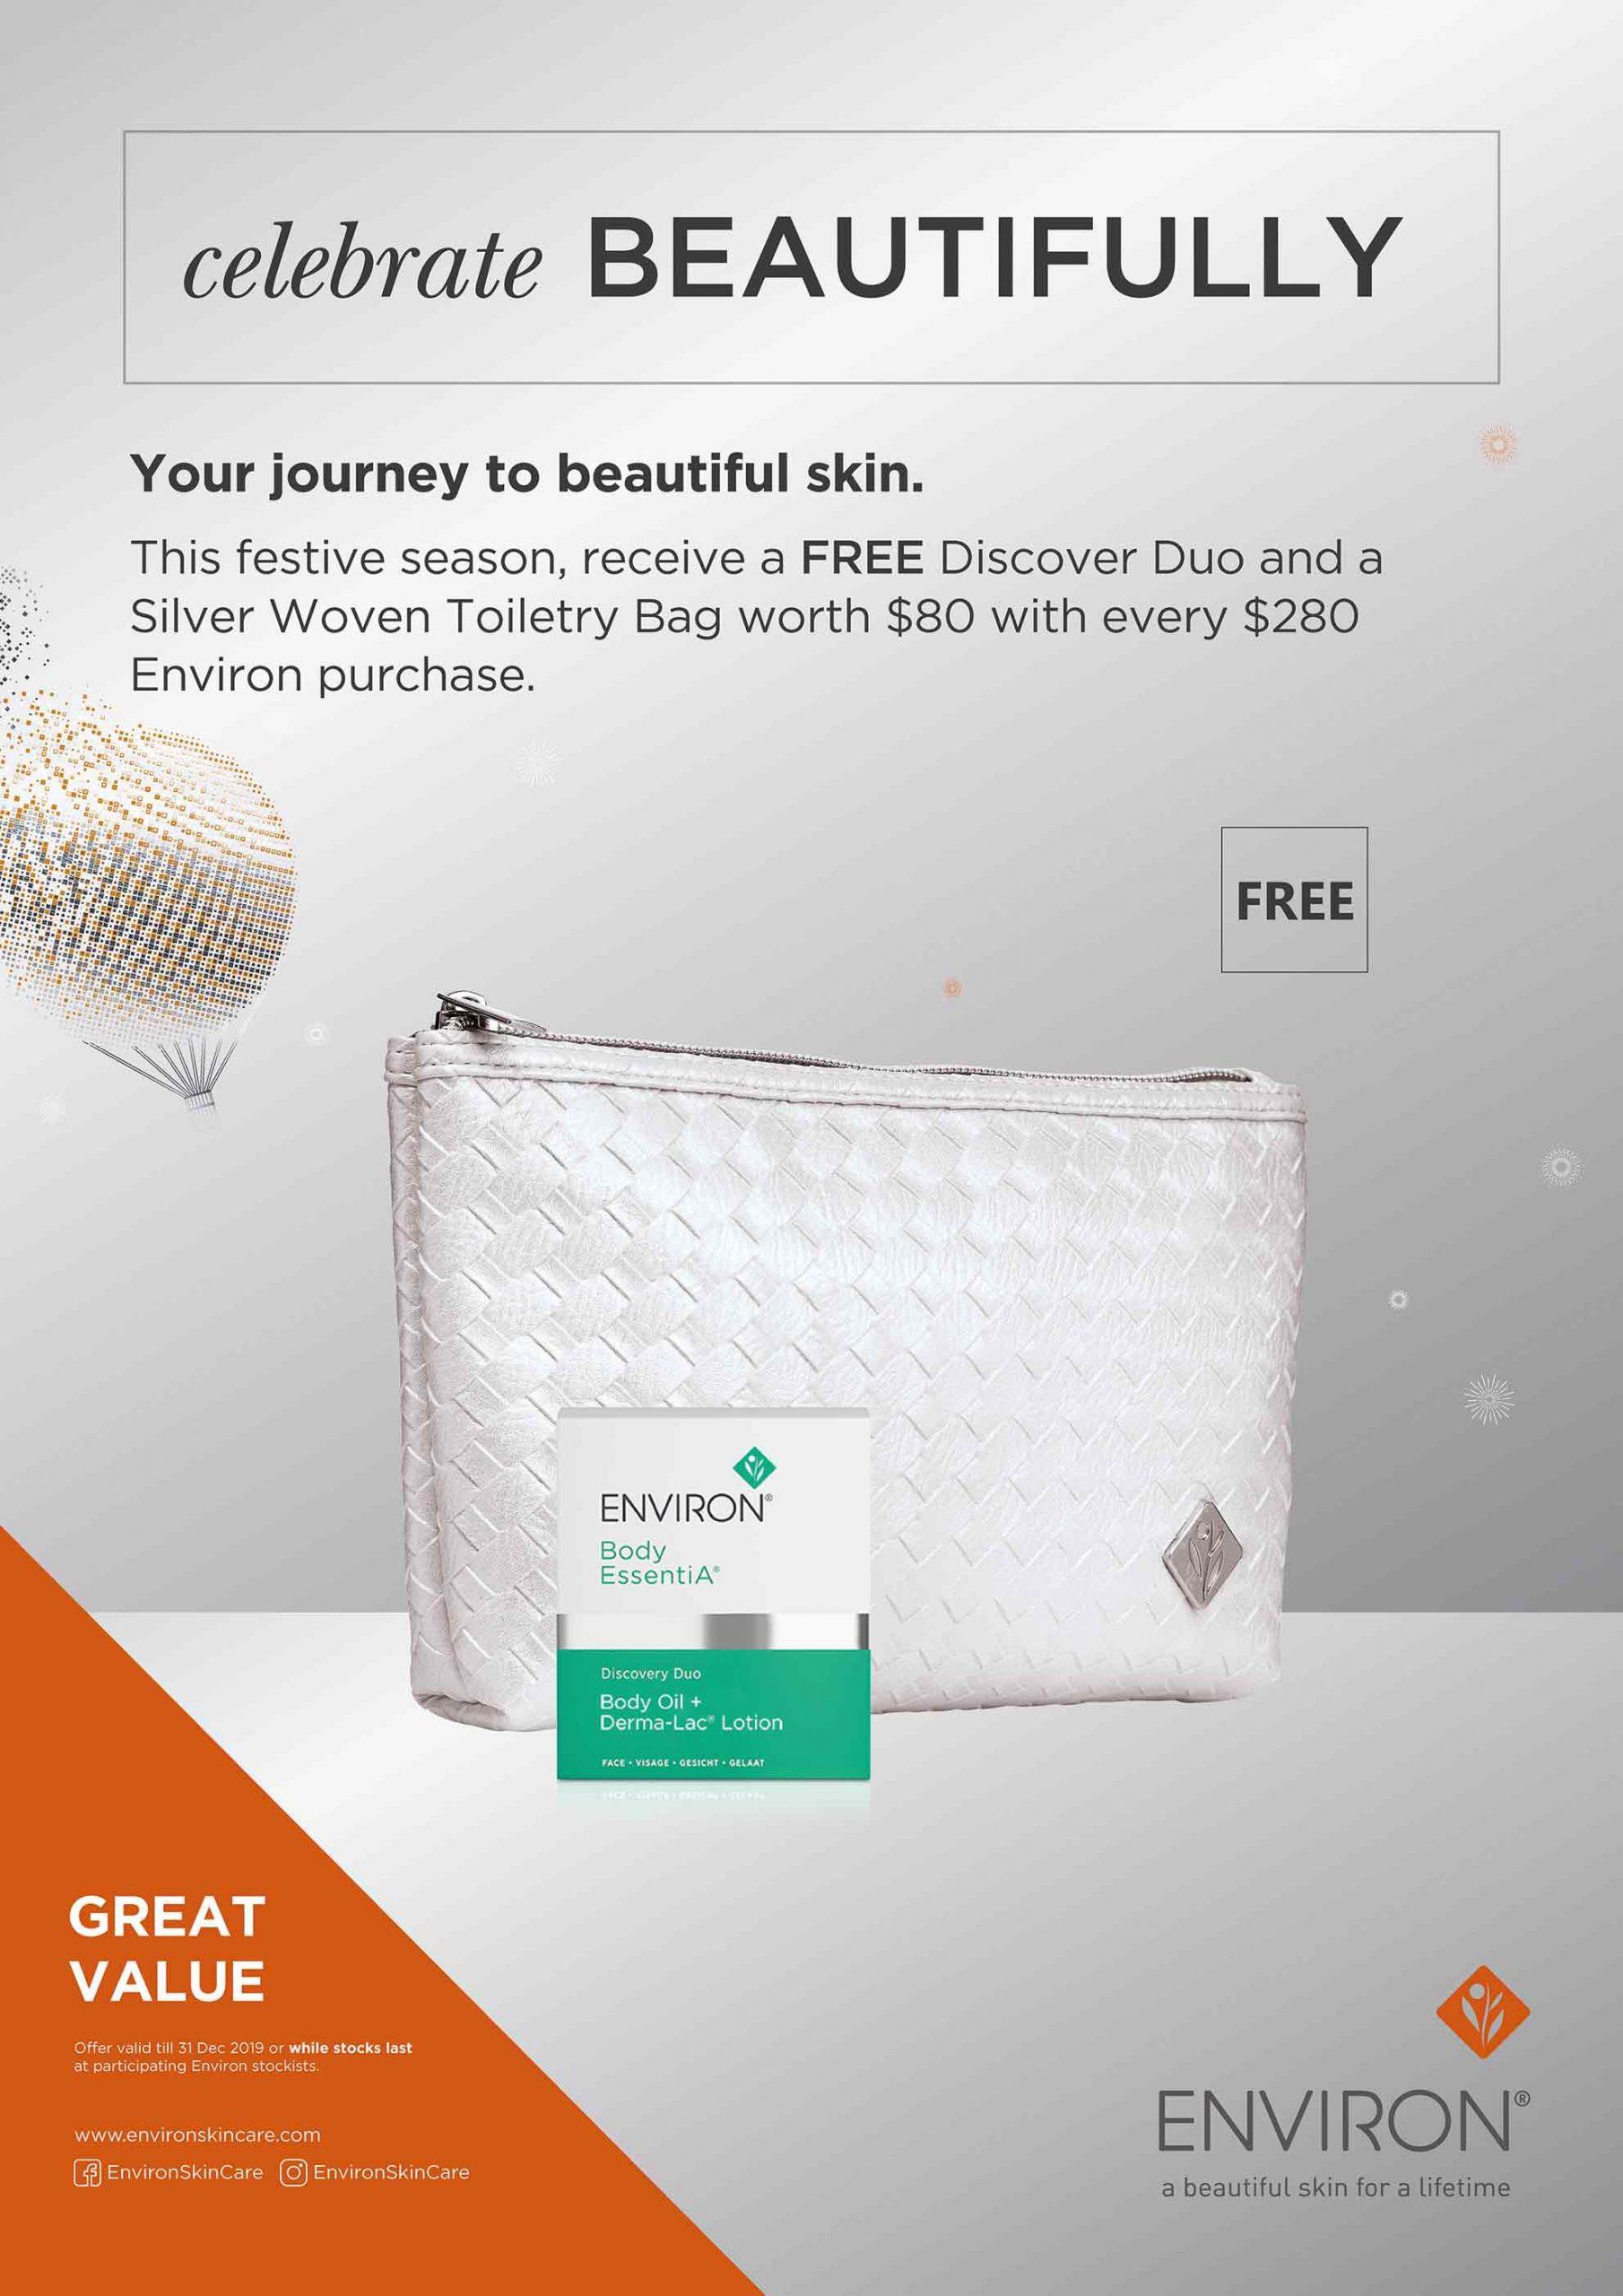 Environ's Free Gift Bag Festive Promo 2019